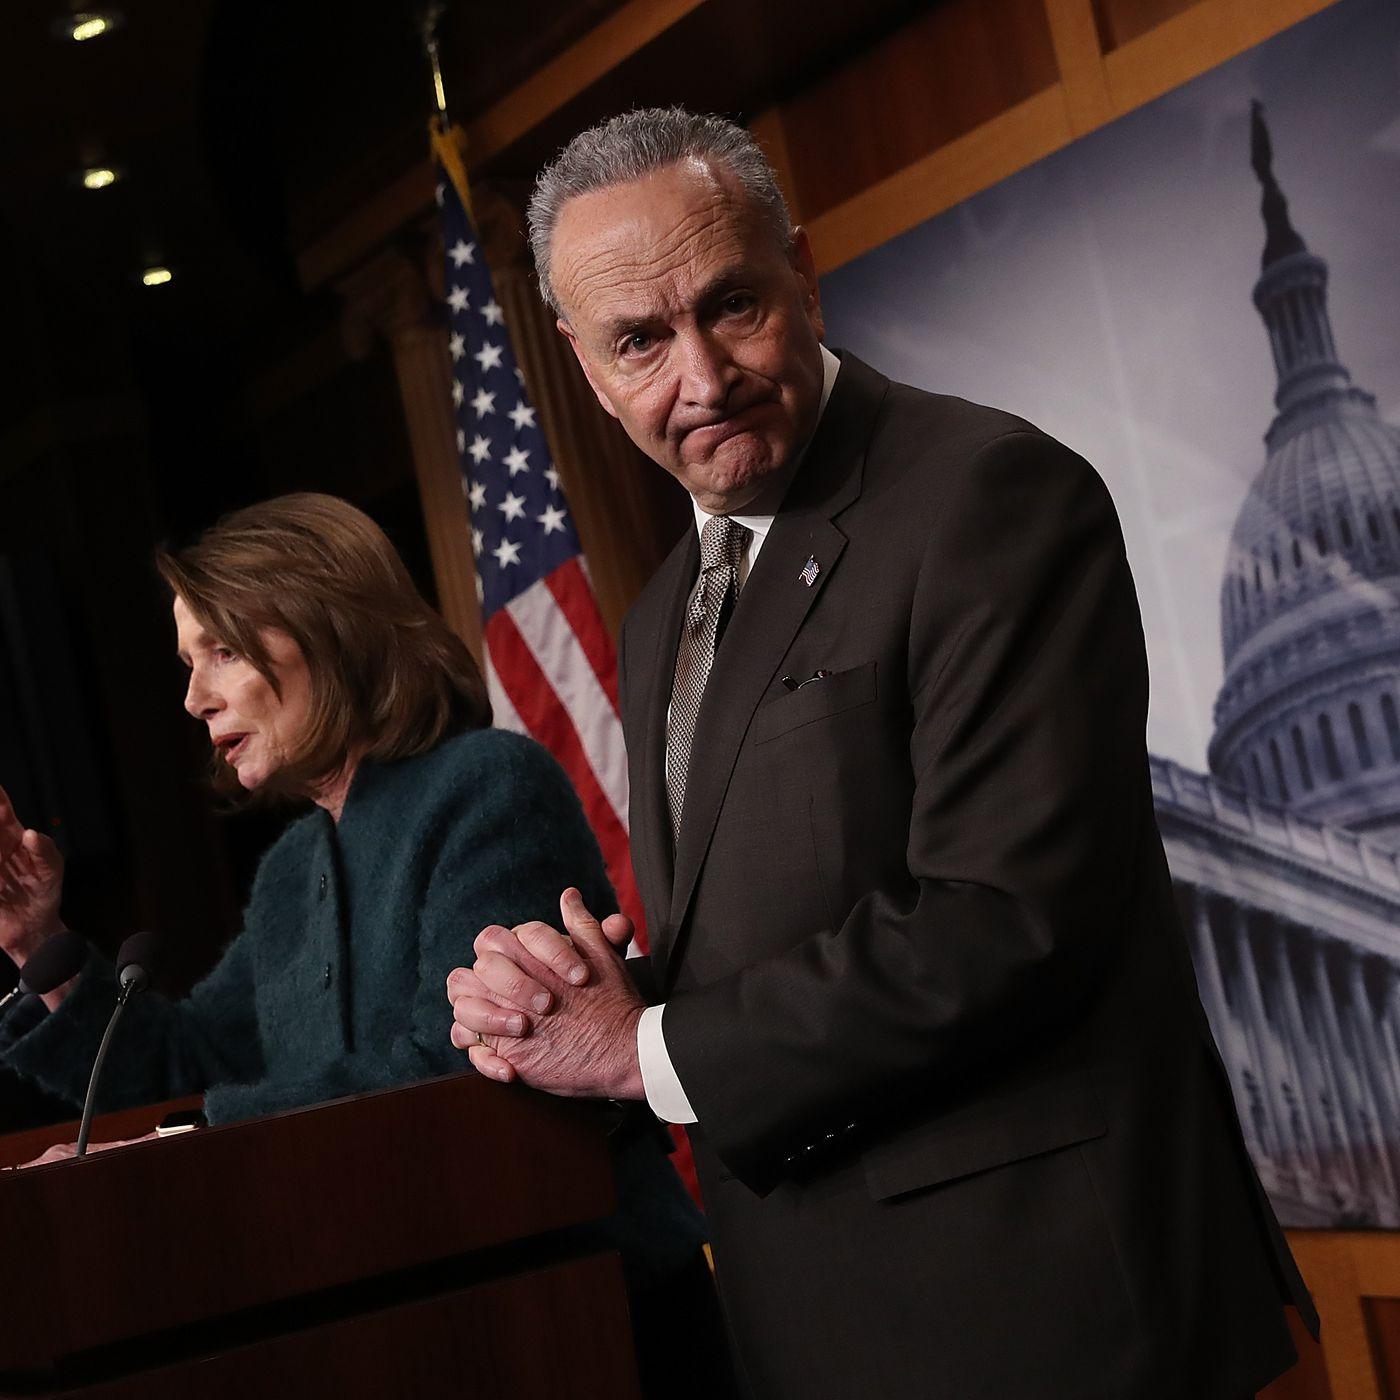 vox.com - Matthew Yglesias - House Democrats must resist Trump's infrastructure trap